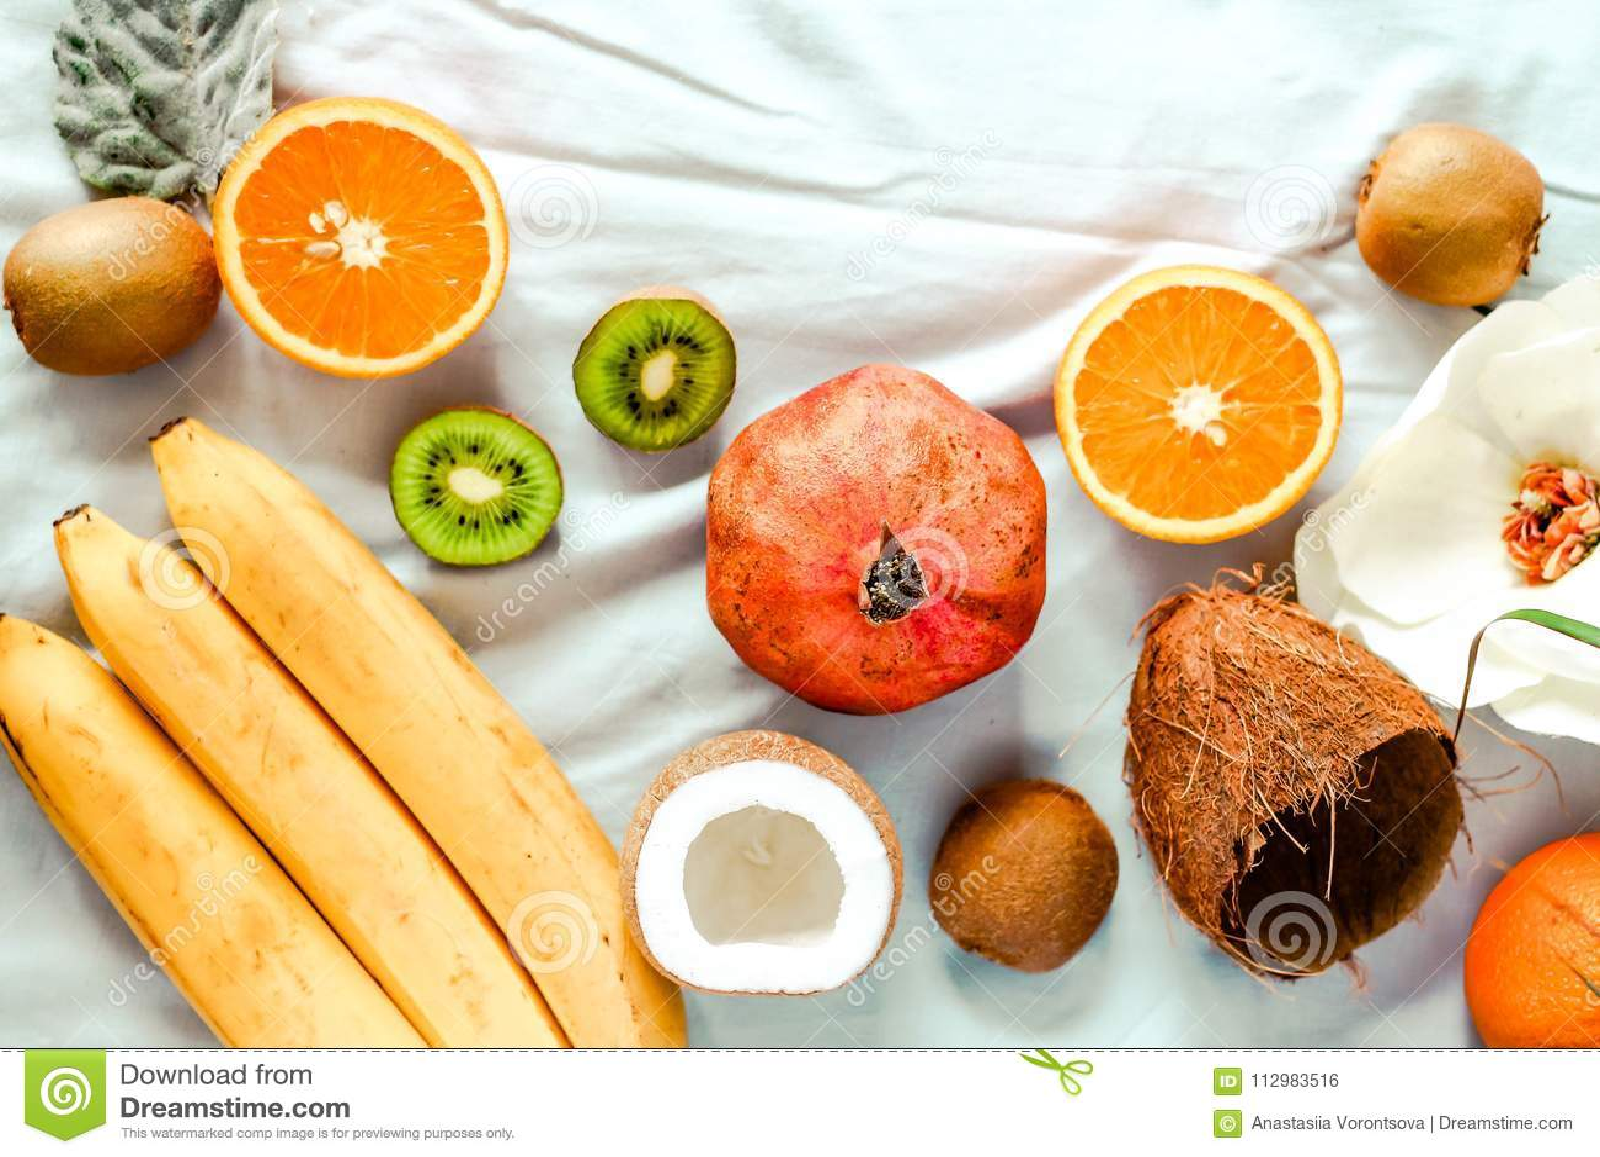 Winter fruits. Kiwi oranges, persimmons. Top view.